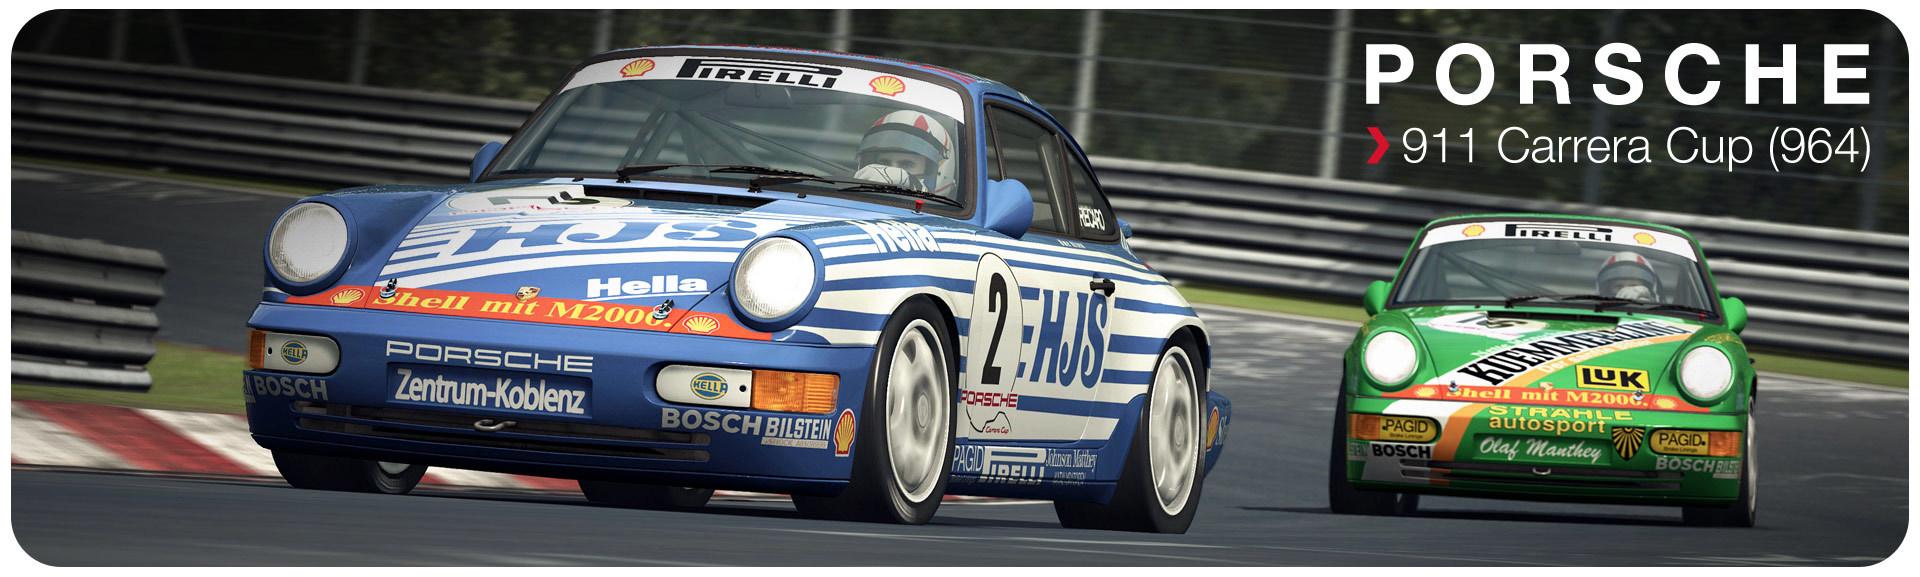 Porsche 911 Carrera Cup